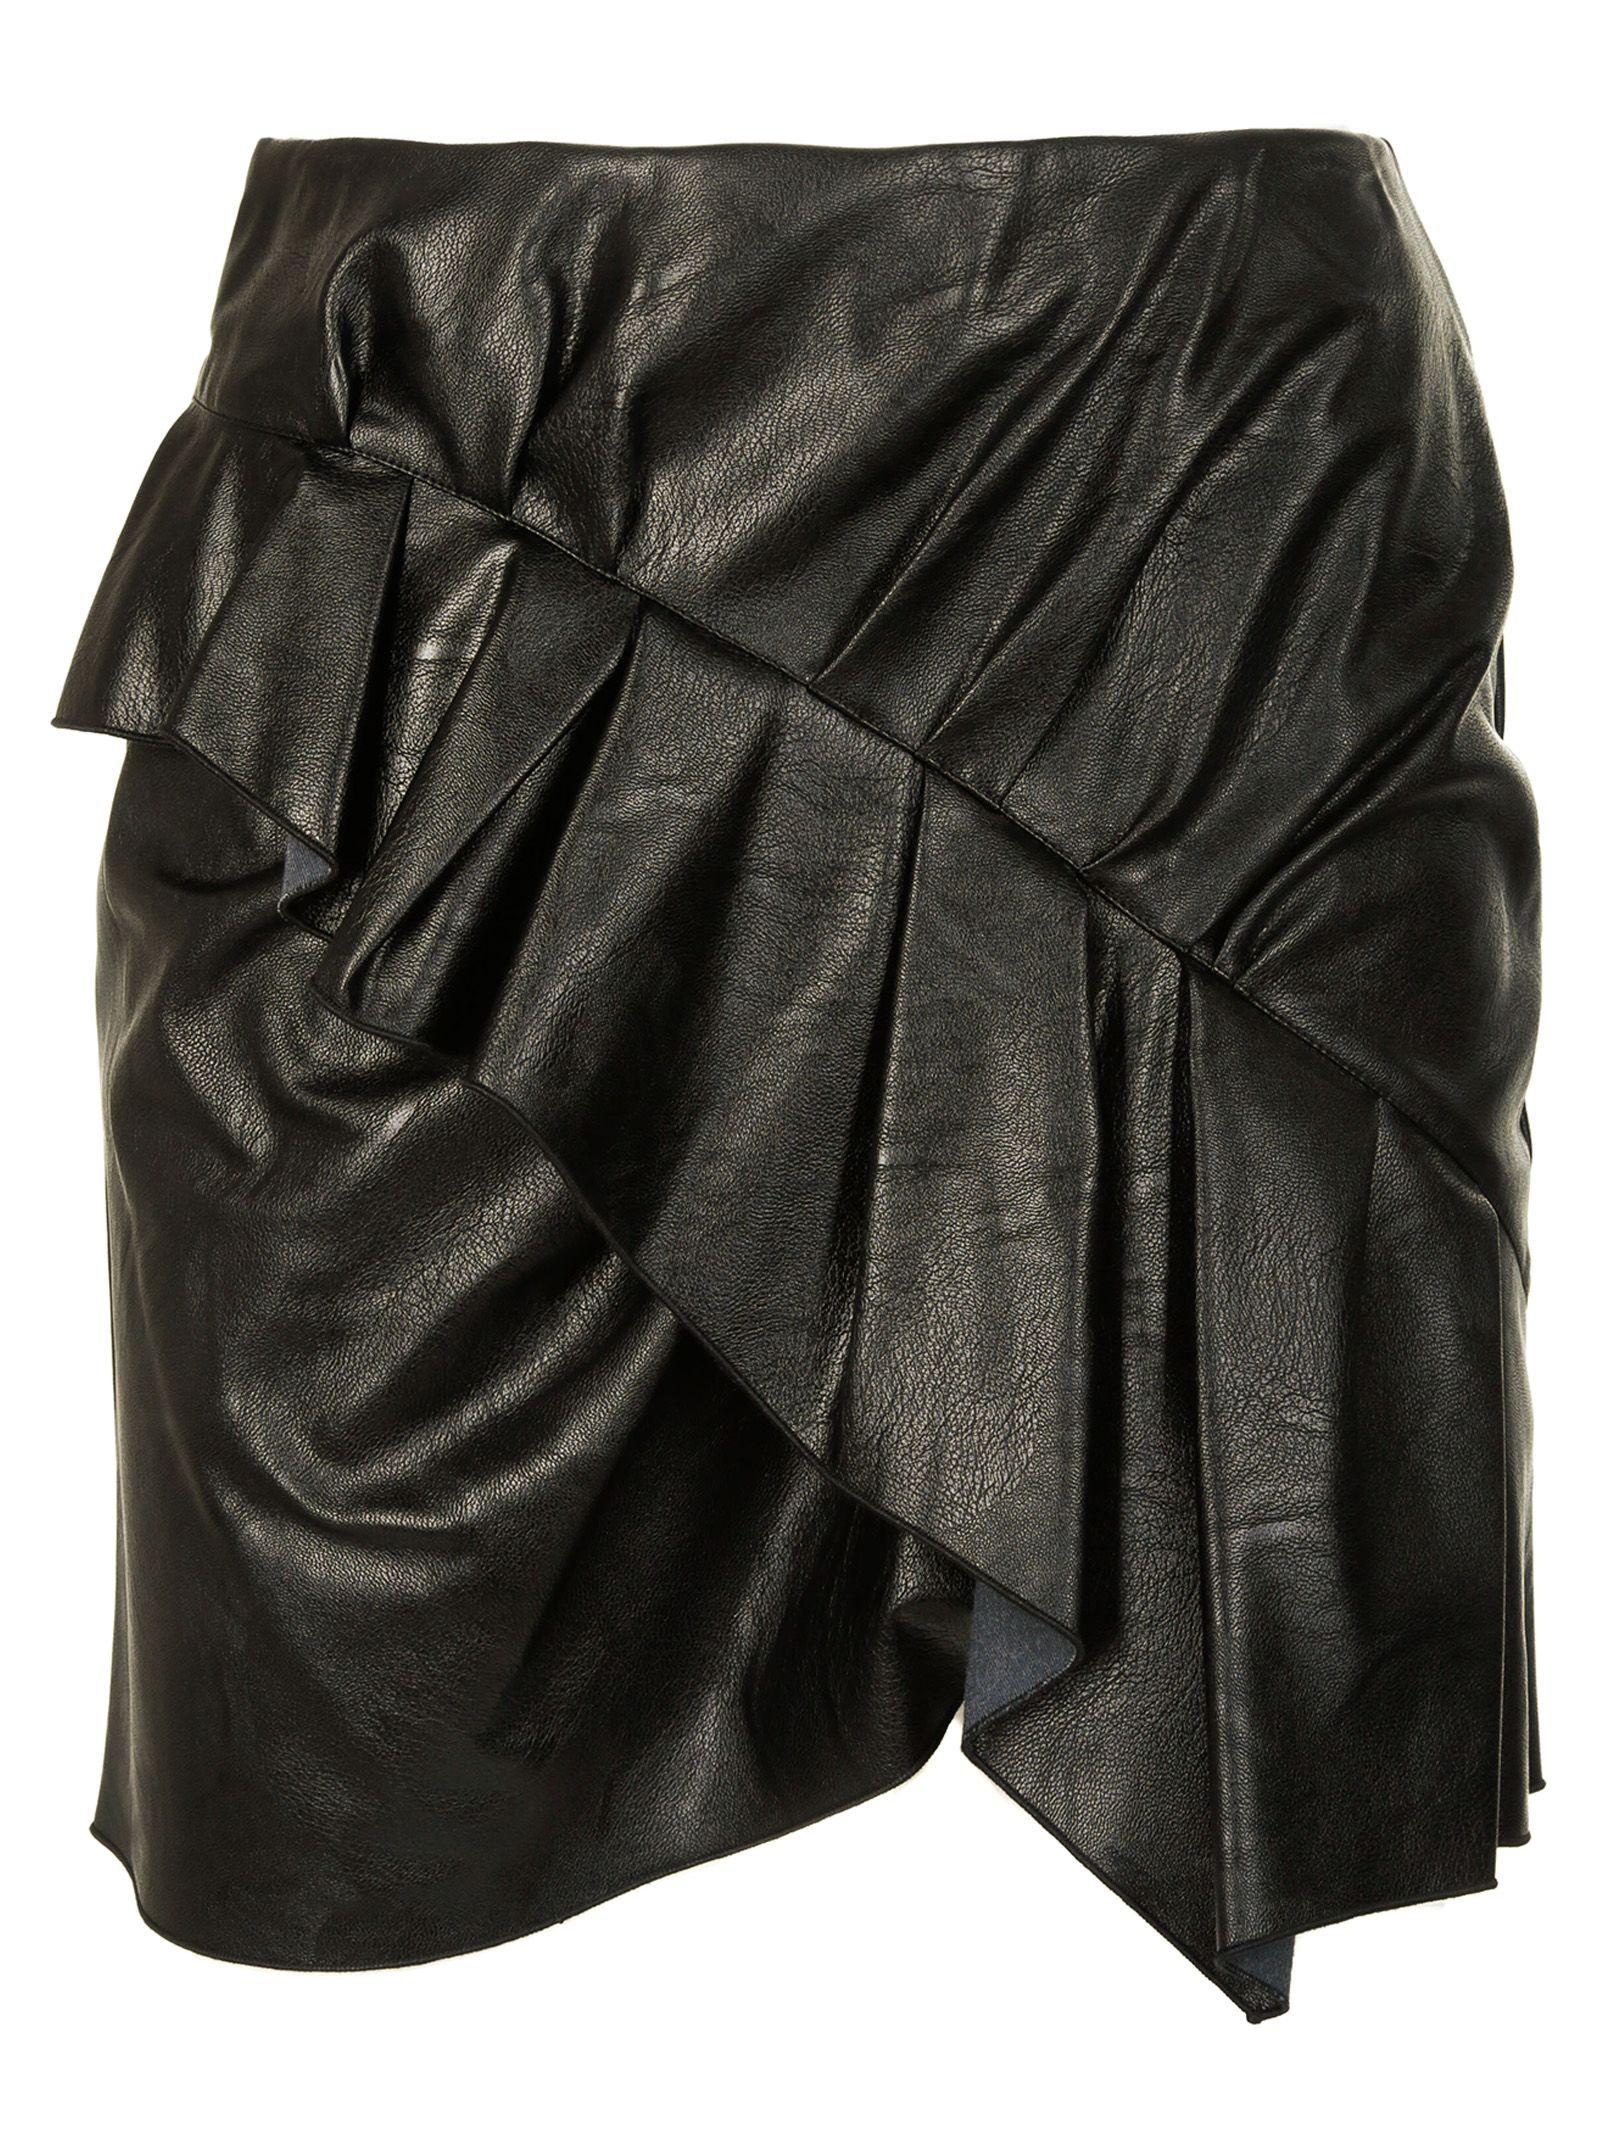 isabel marant -  Ruffled Skirt